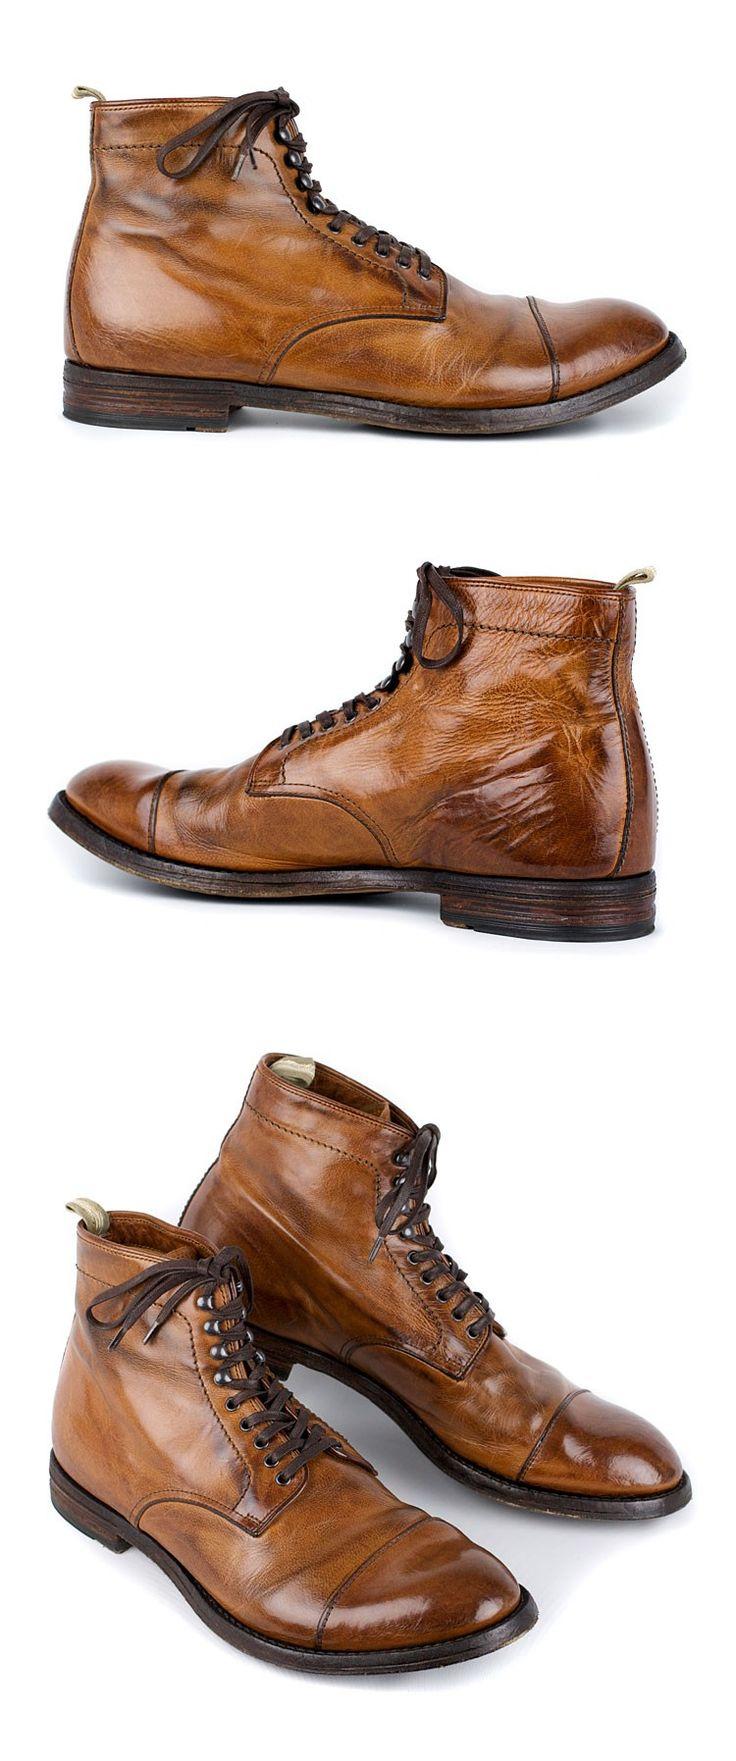 Officine Creative Anatomia 16 Men's Lace-up Boot - Cognac | resoul.com